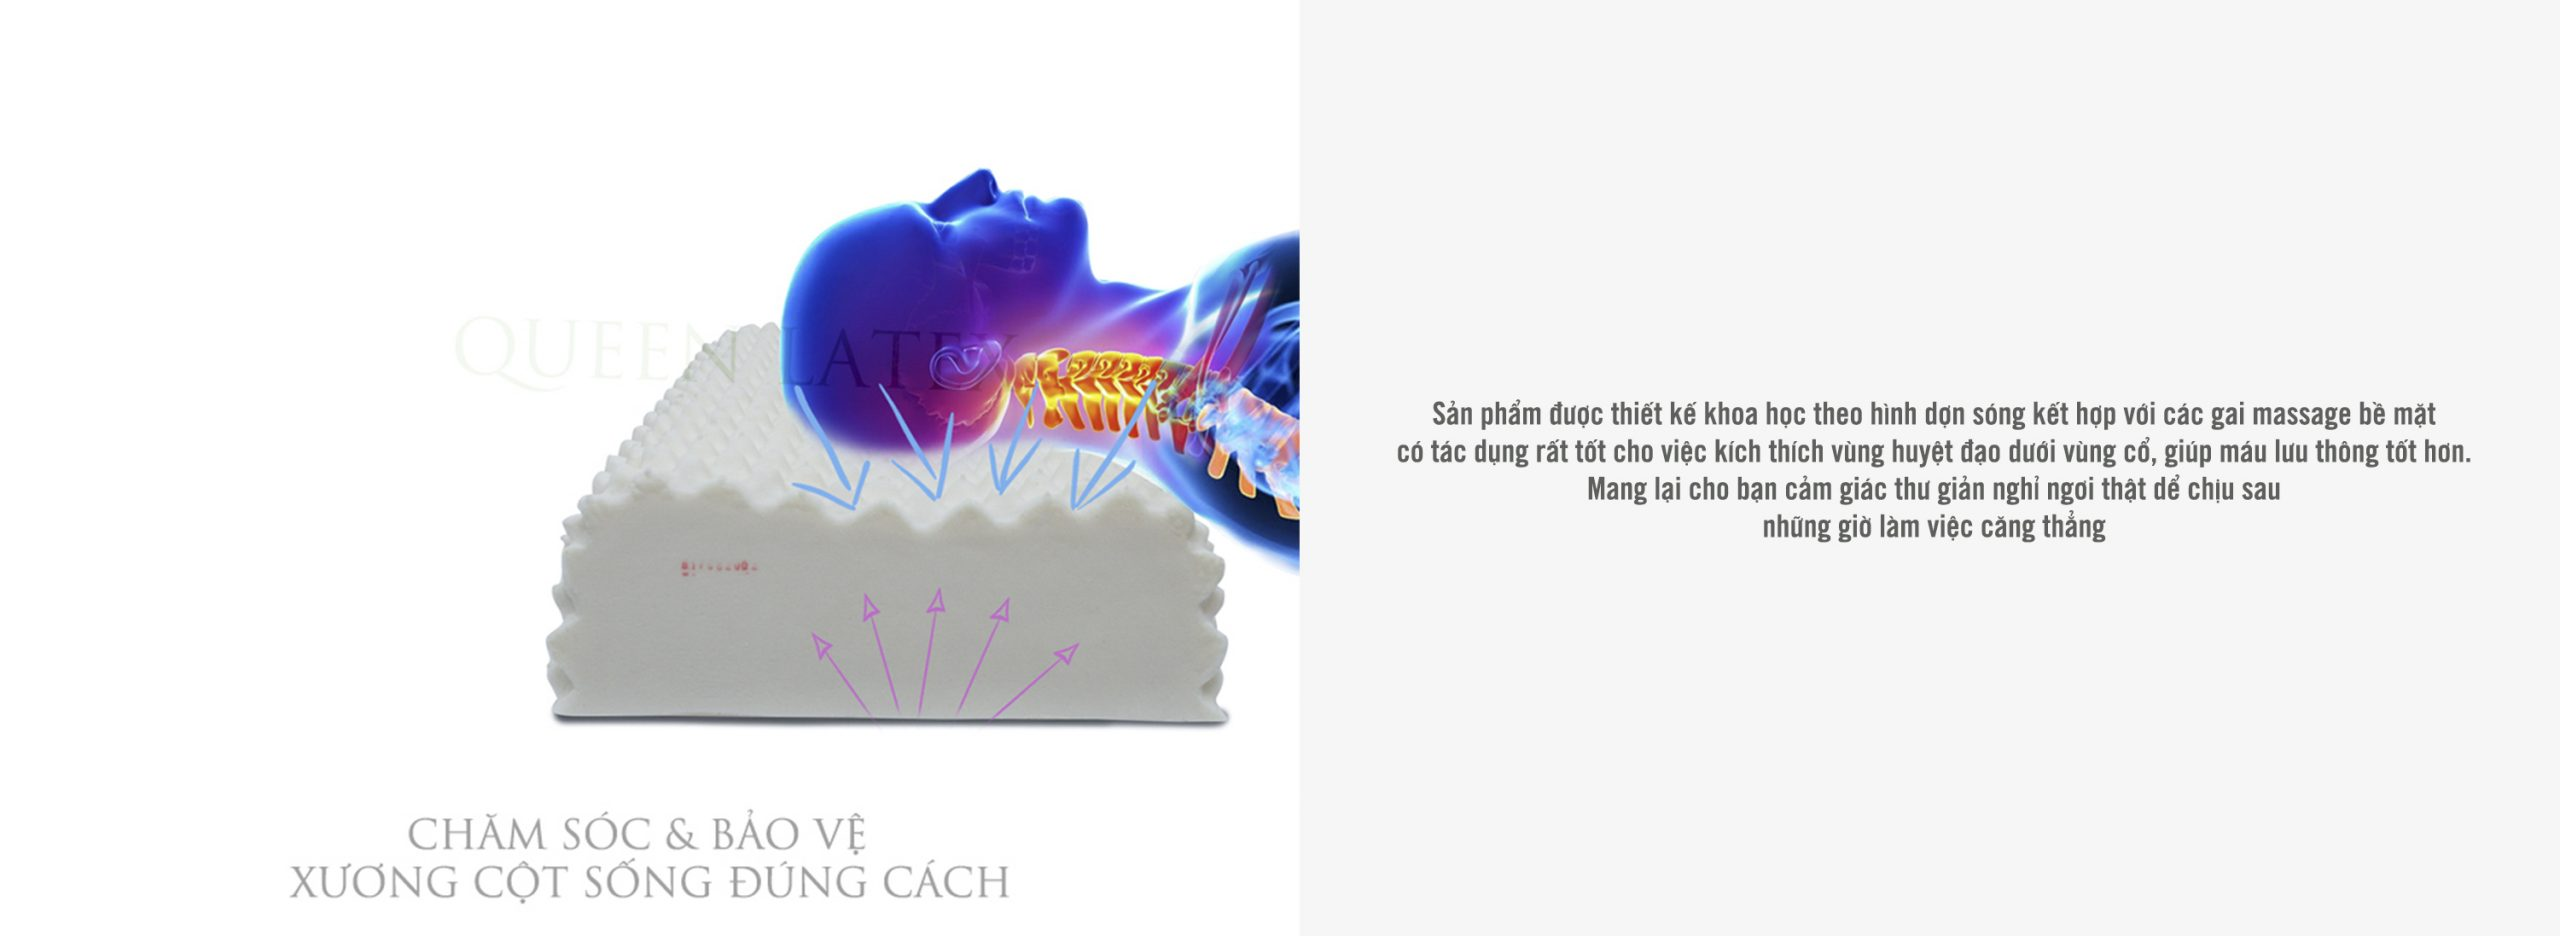 Gối cao su massage G/G2 - Vạn Thành goi cao su thien nhien 12 scaled